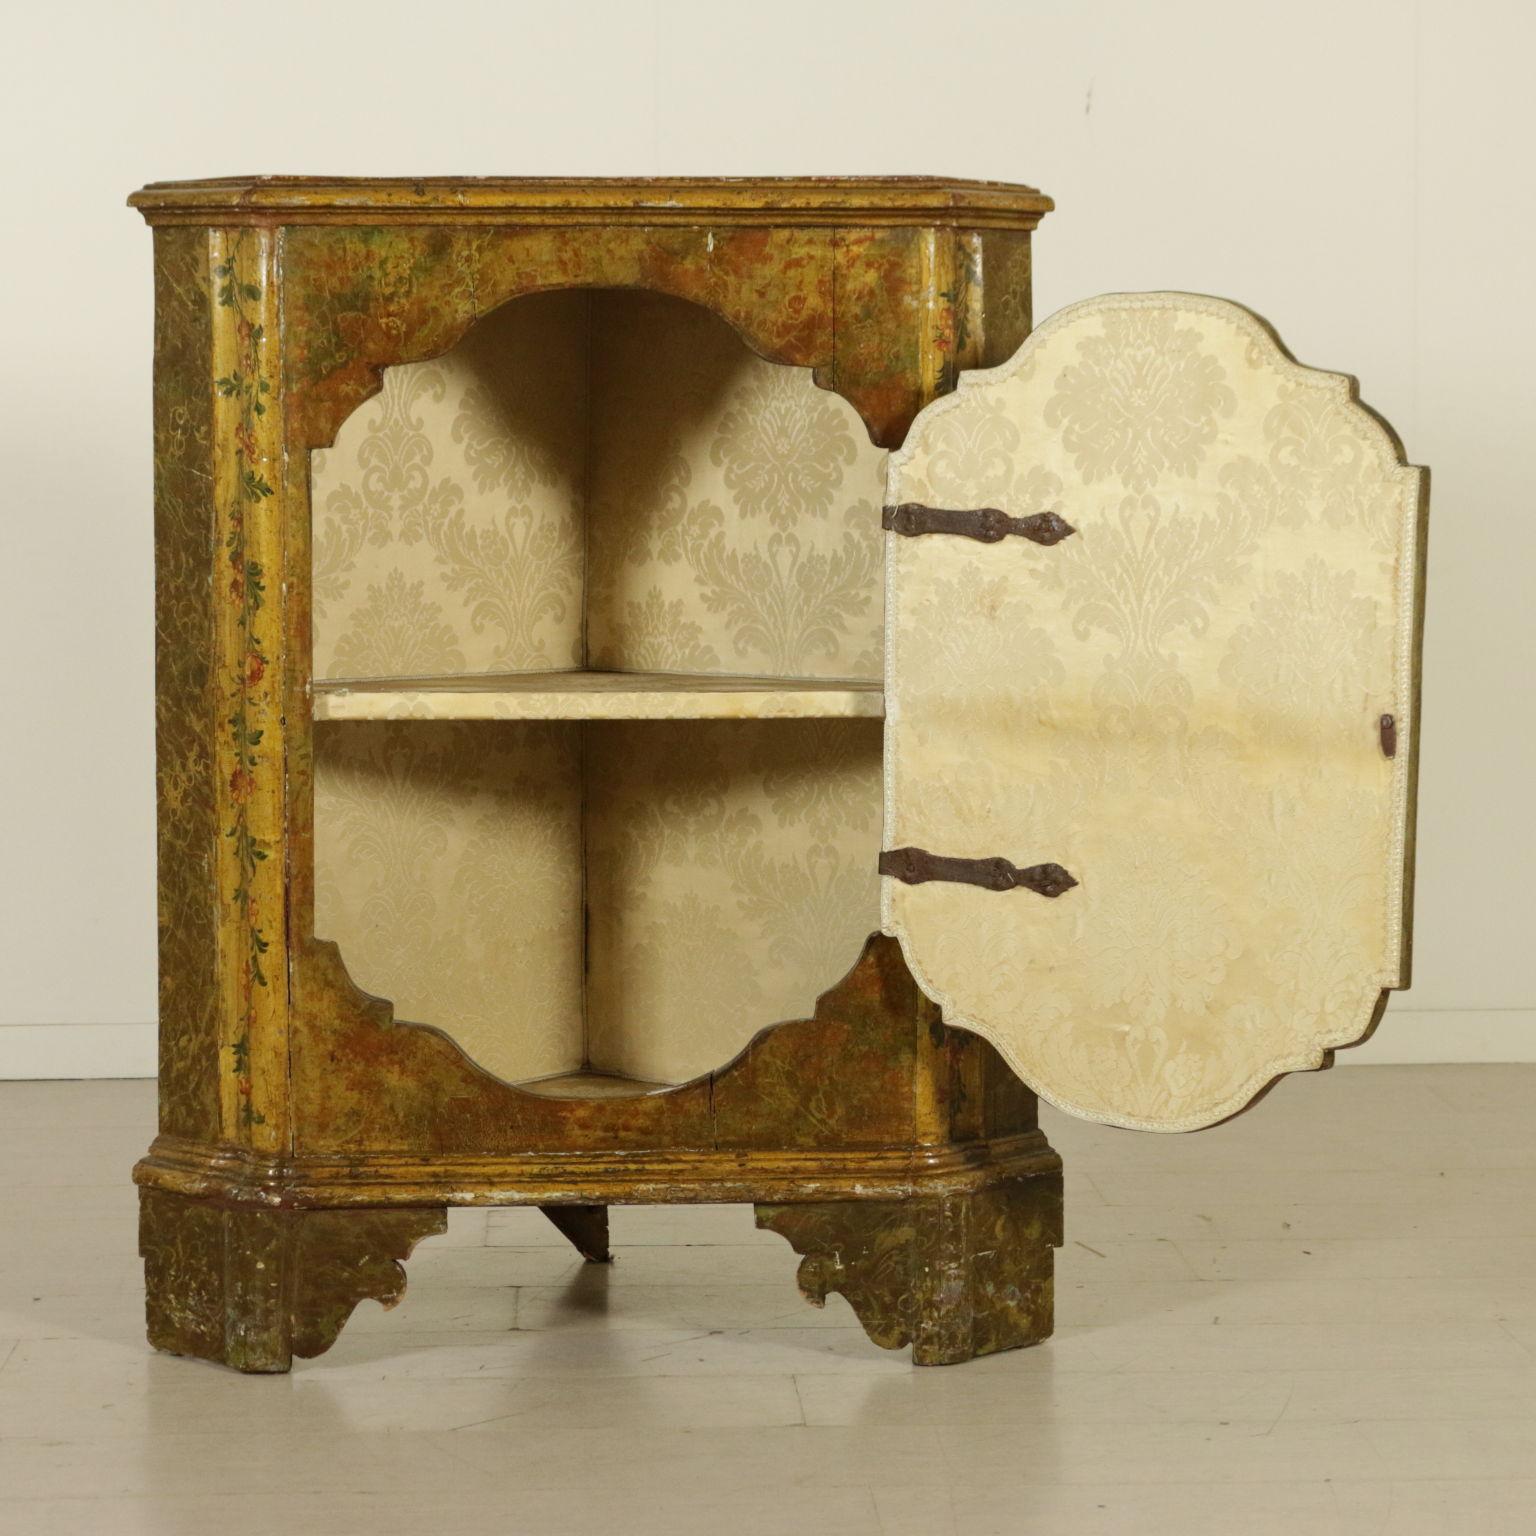 Corner to arte povera - Corner cupboards - Antiques - dimanoinmano.it